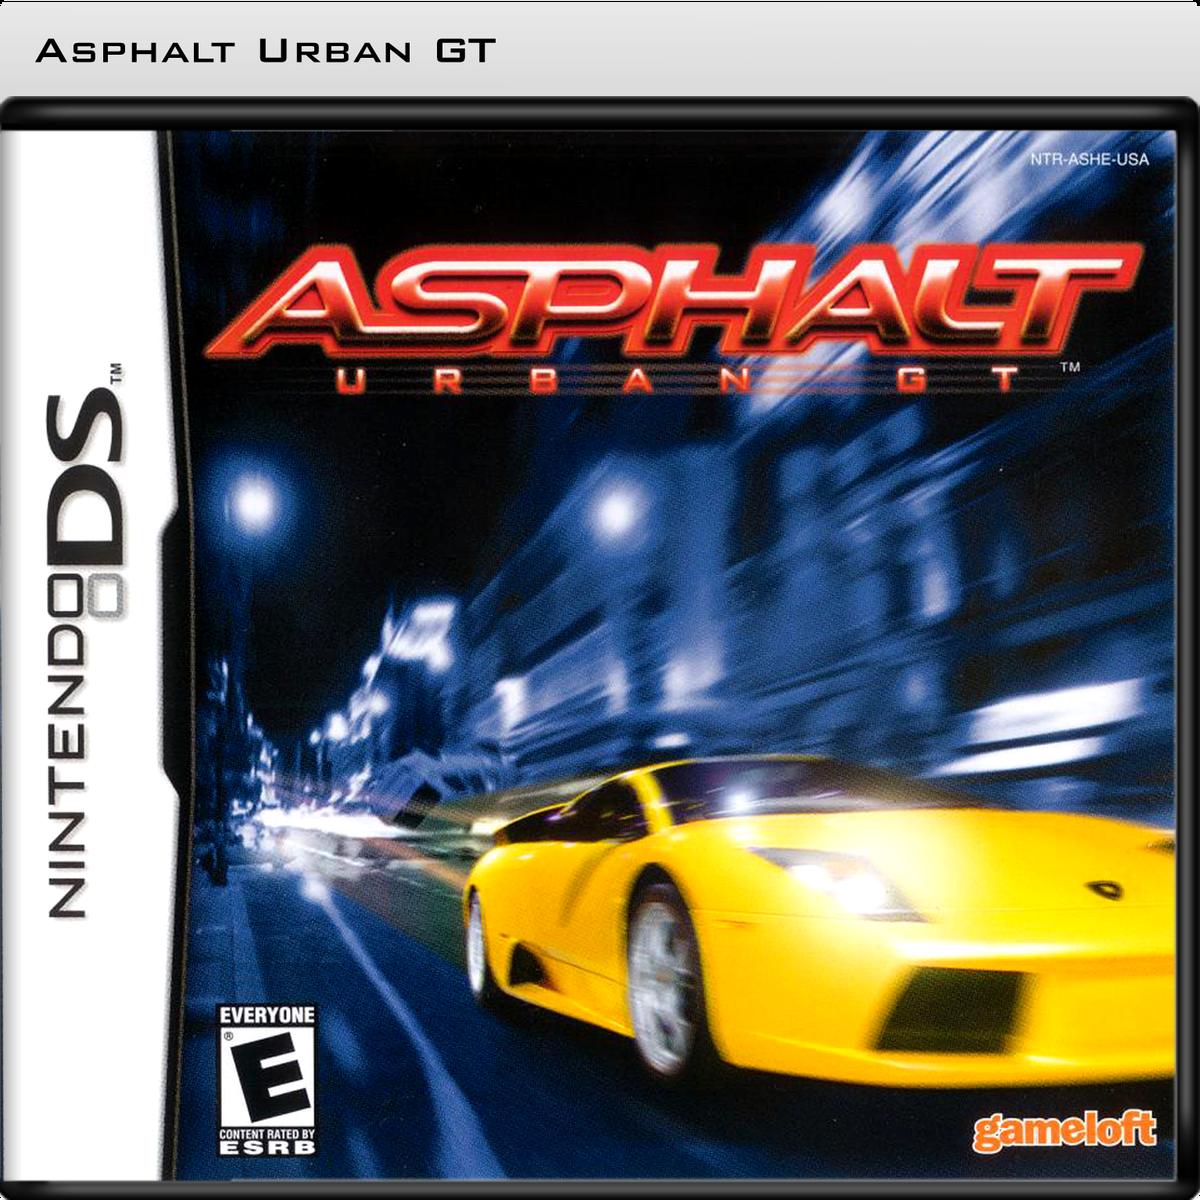 Asphalt Urban GT